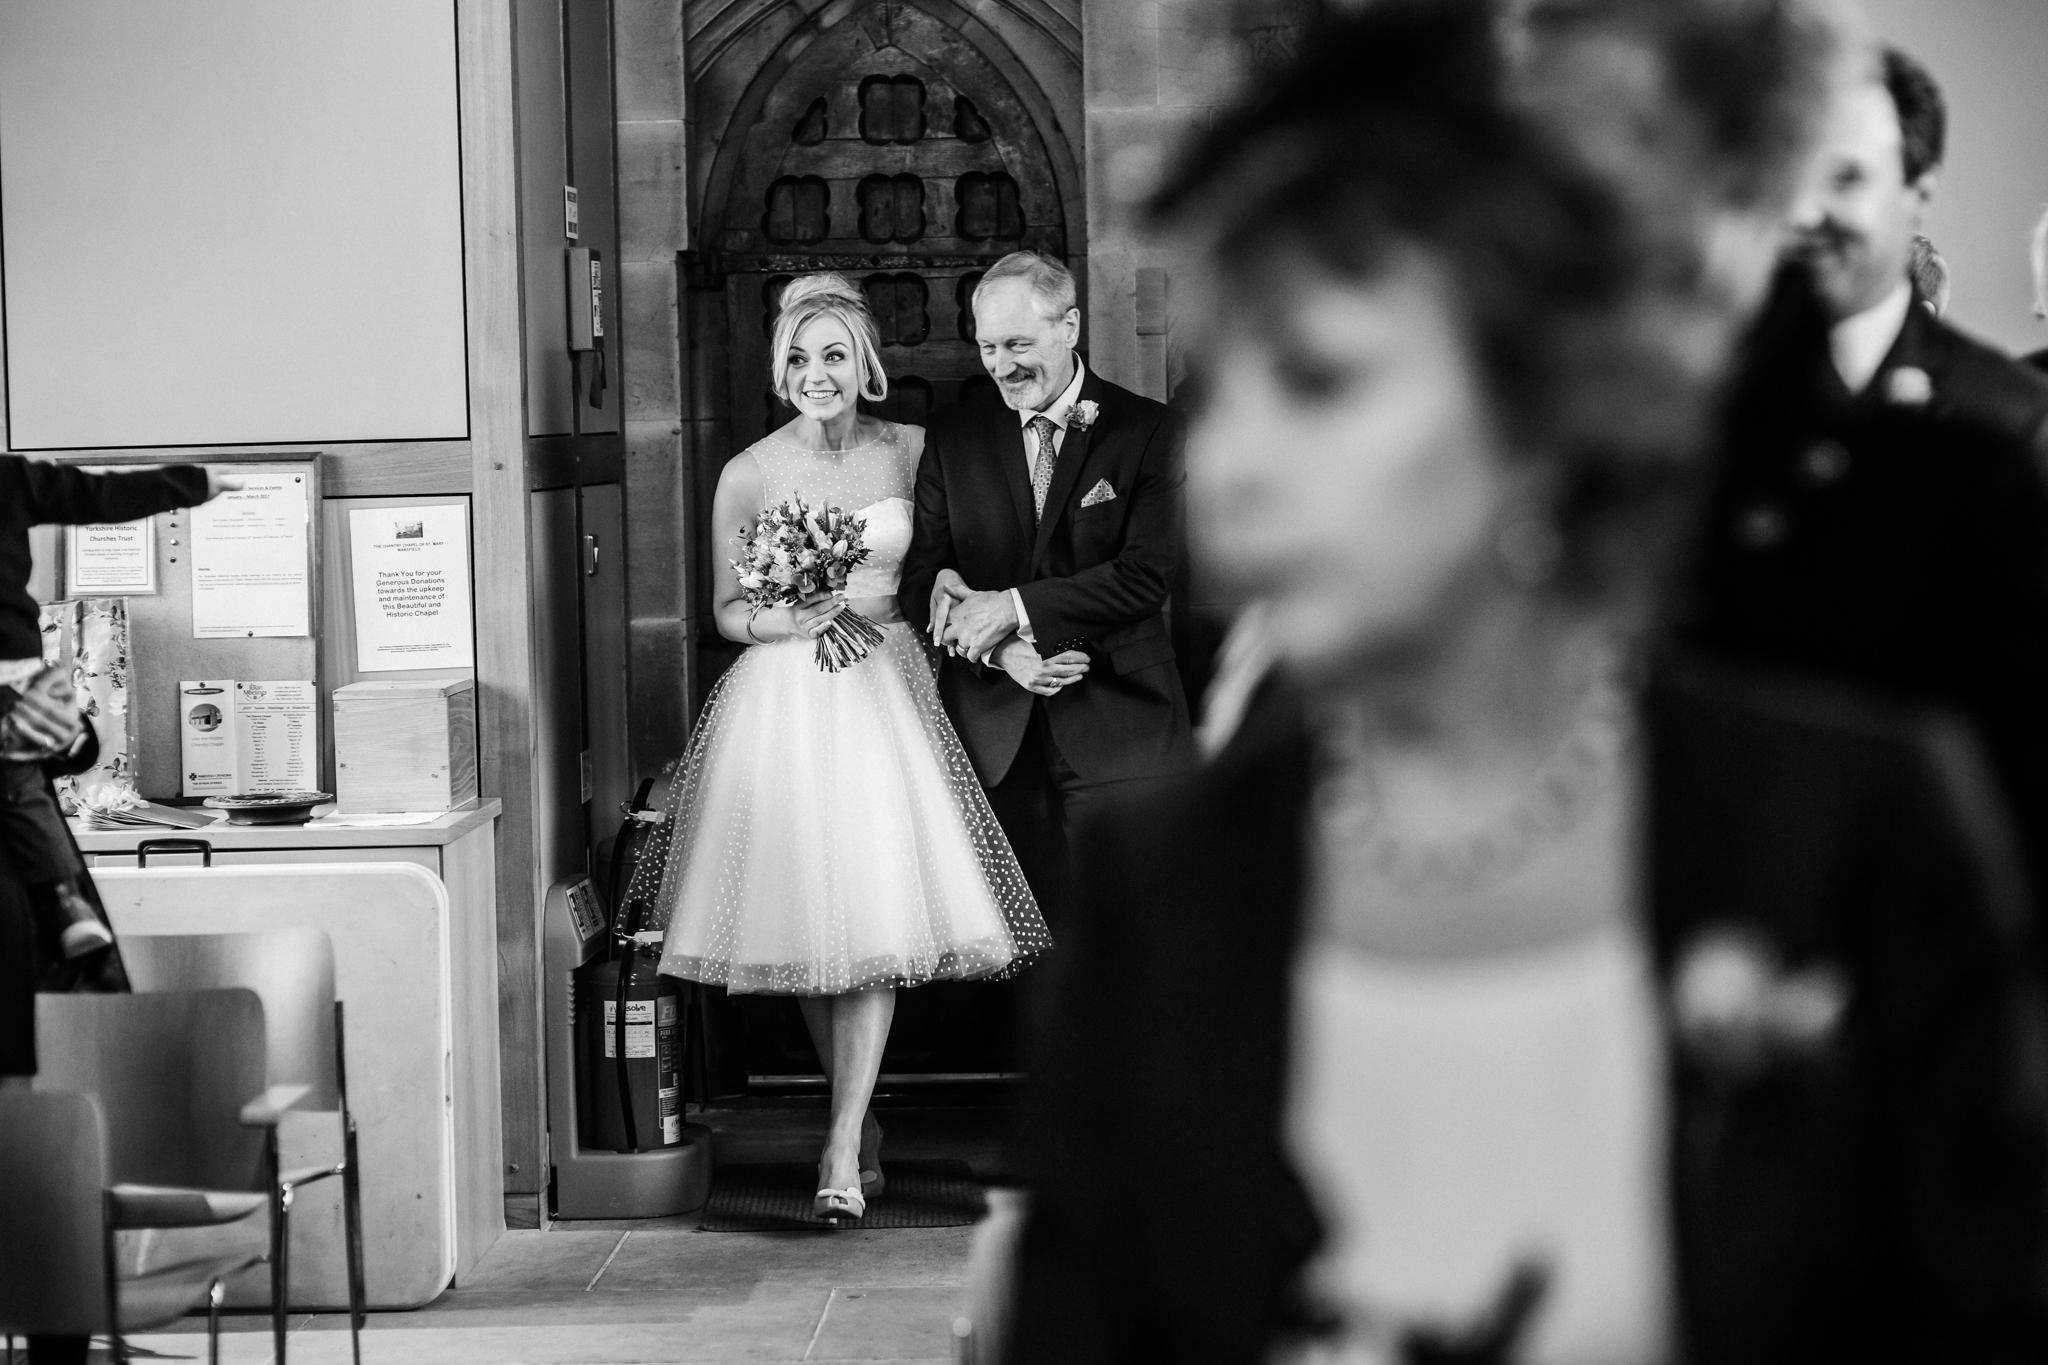 the bridal entrance